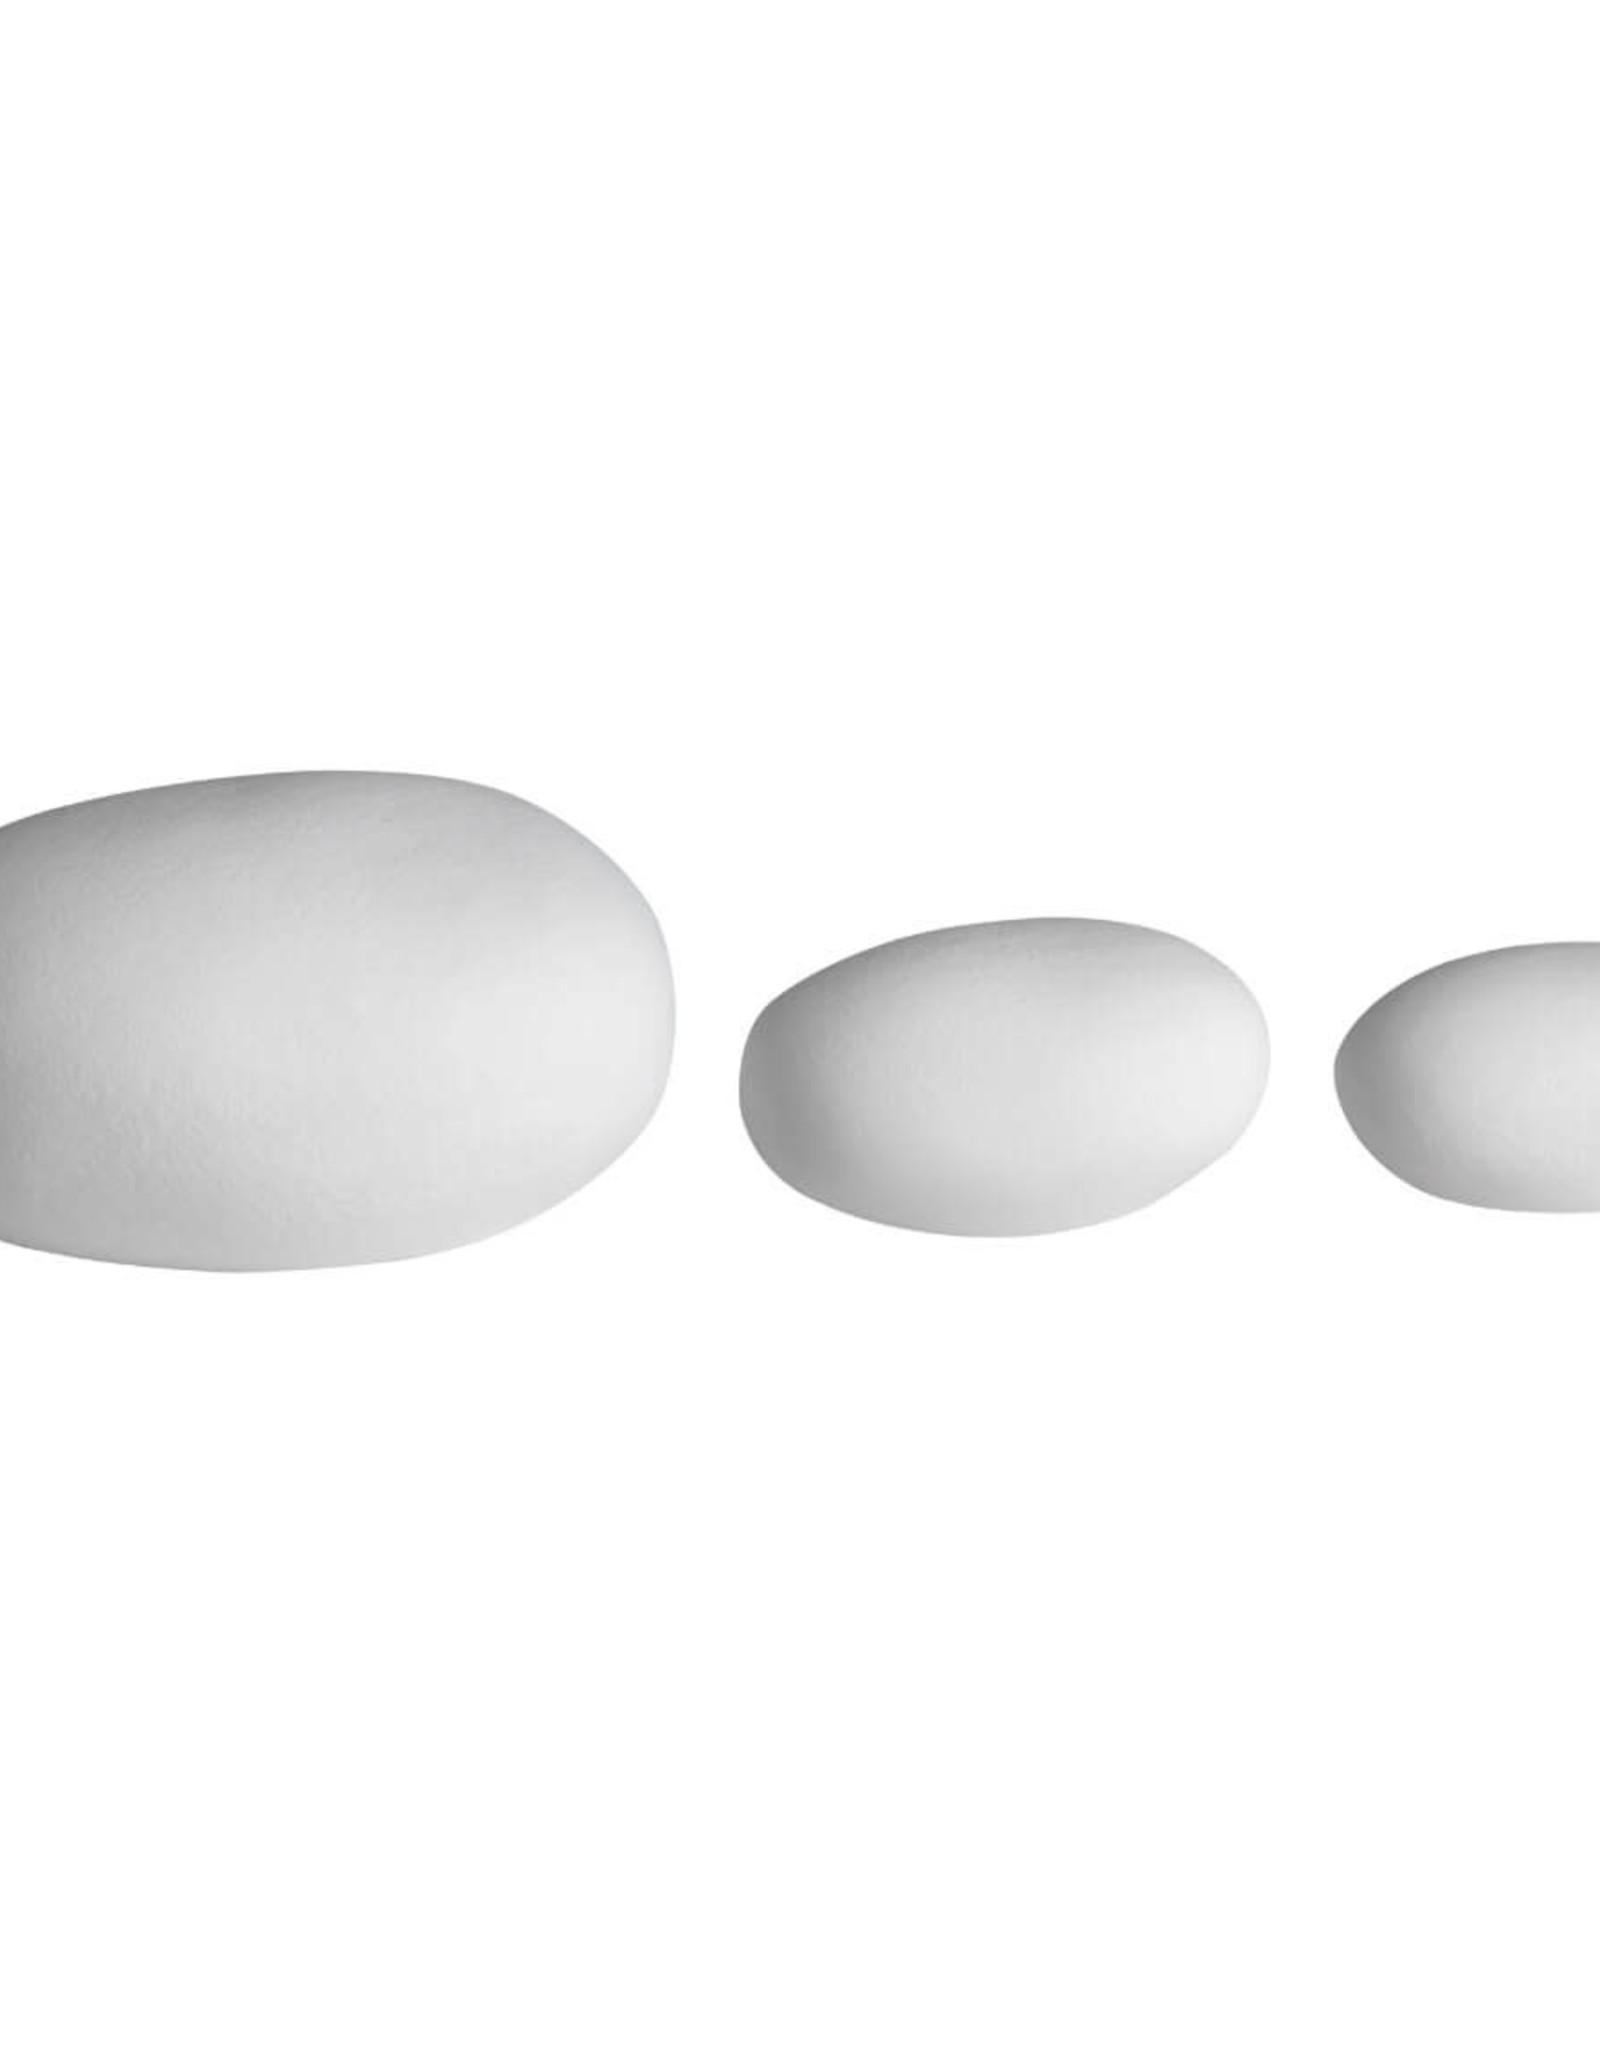 Räder Rader - Led light pebble set of 3pcs